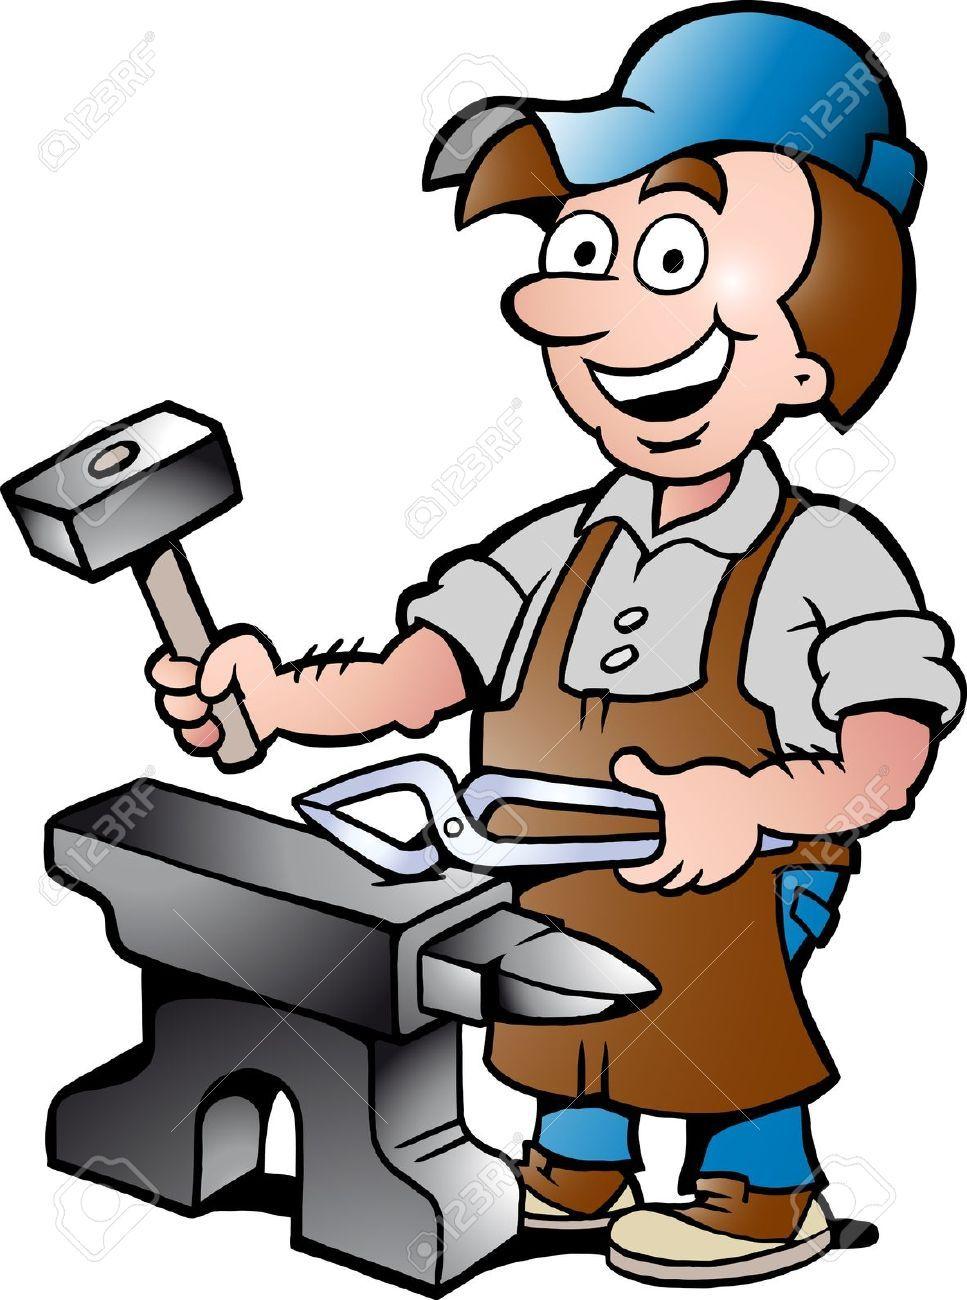 hight resolution of 967x1300 17901074 hand drawn vector illustration of an happy blacksmith